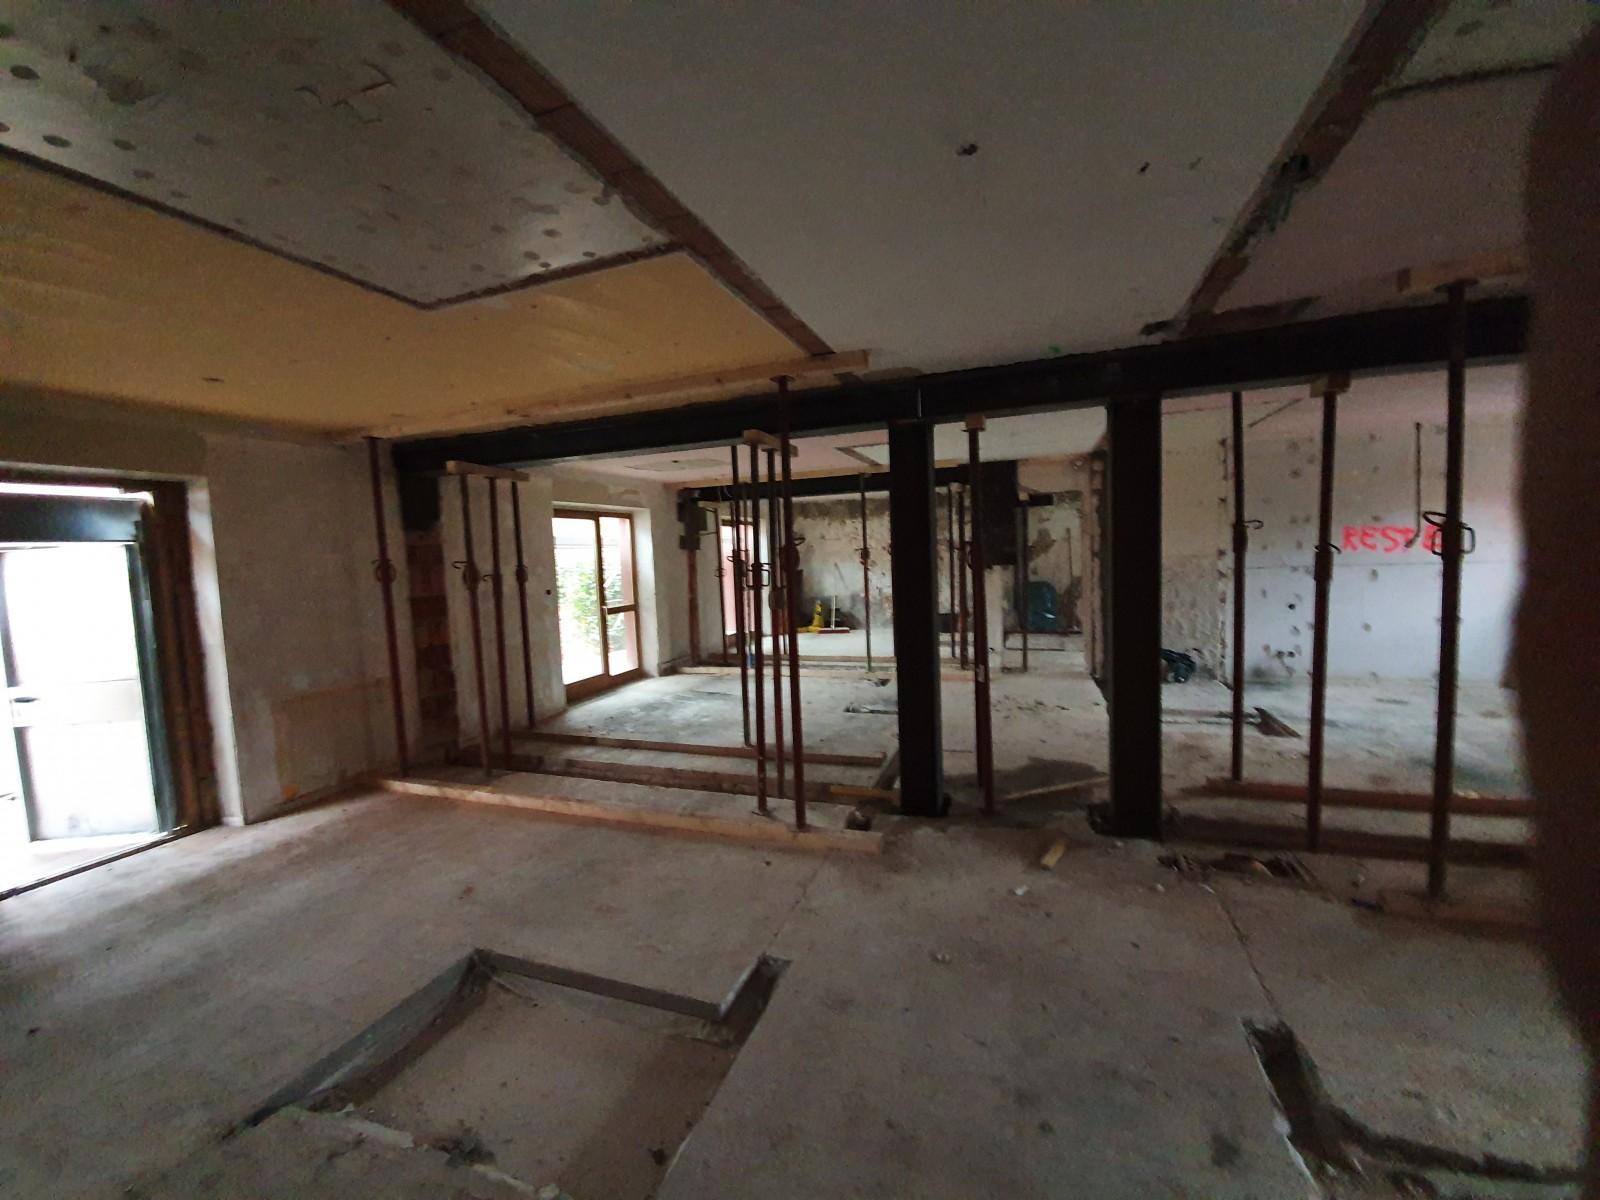 Rénovation d'un hôtel bas-rhin